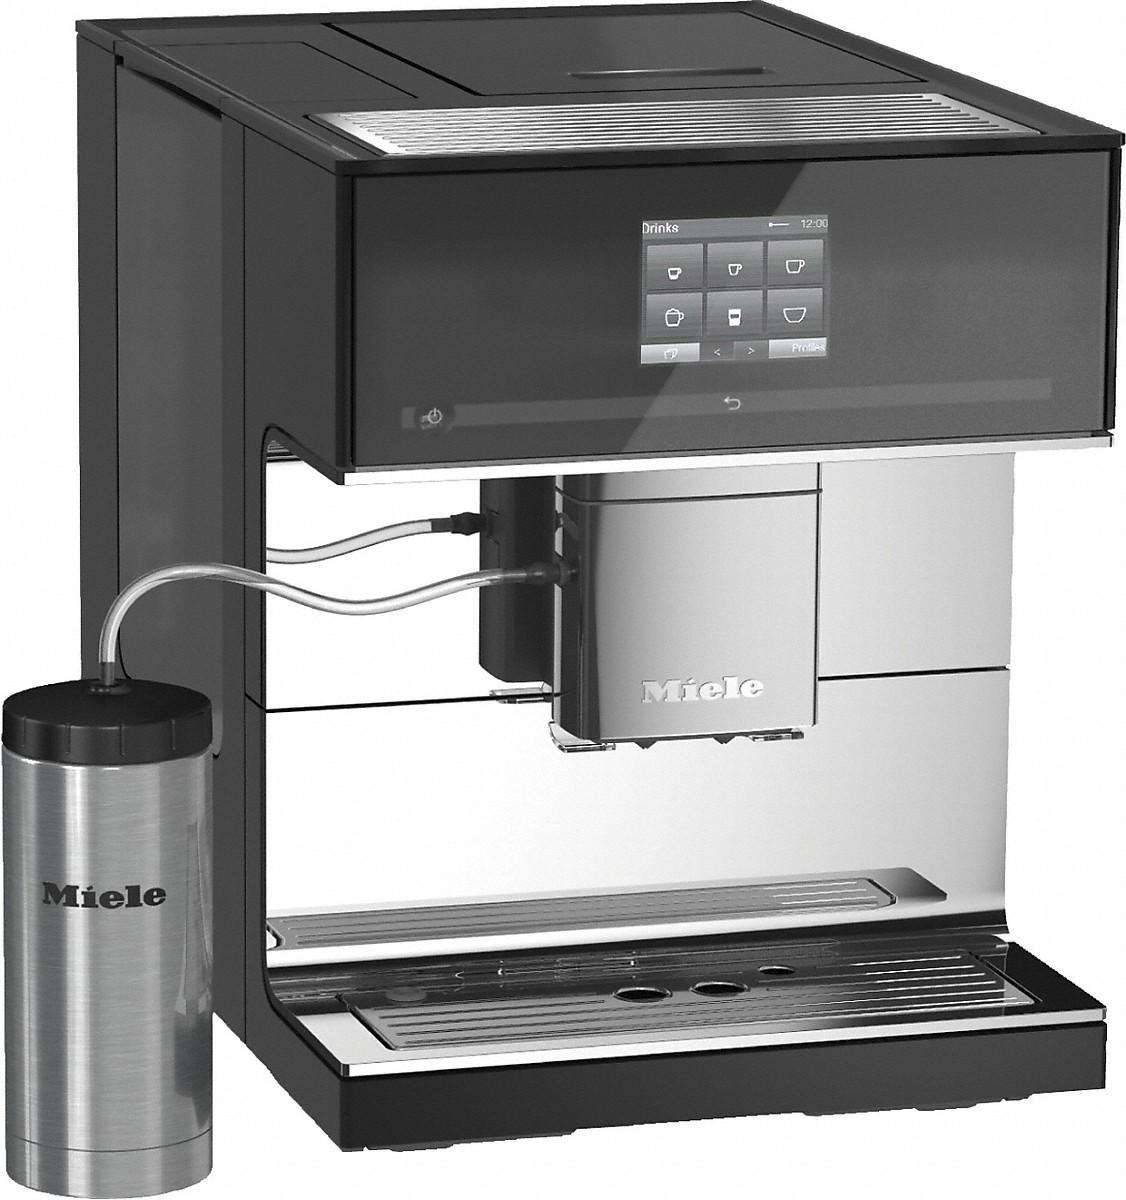 Miele Cm 7500 Countertop Coffee Machine